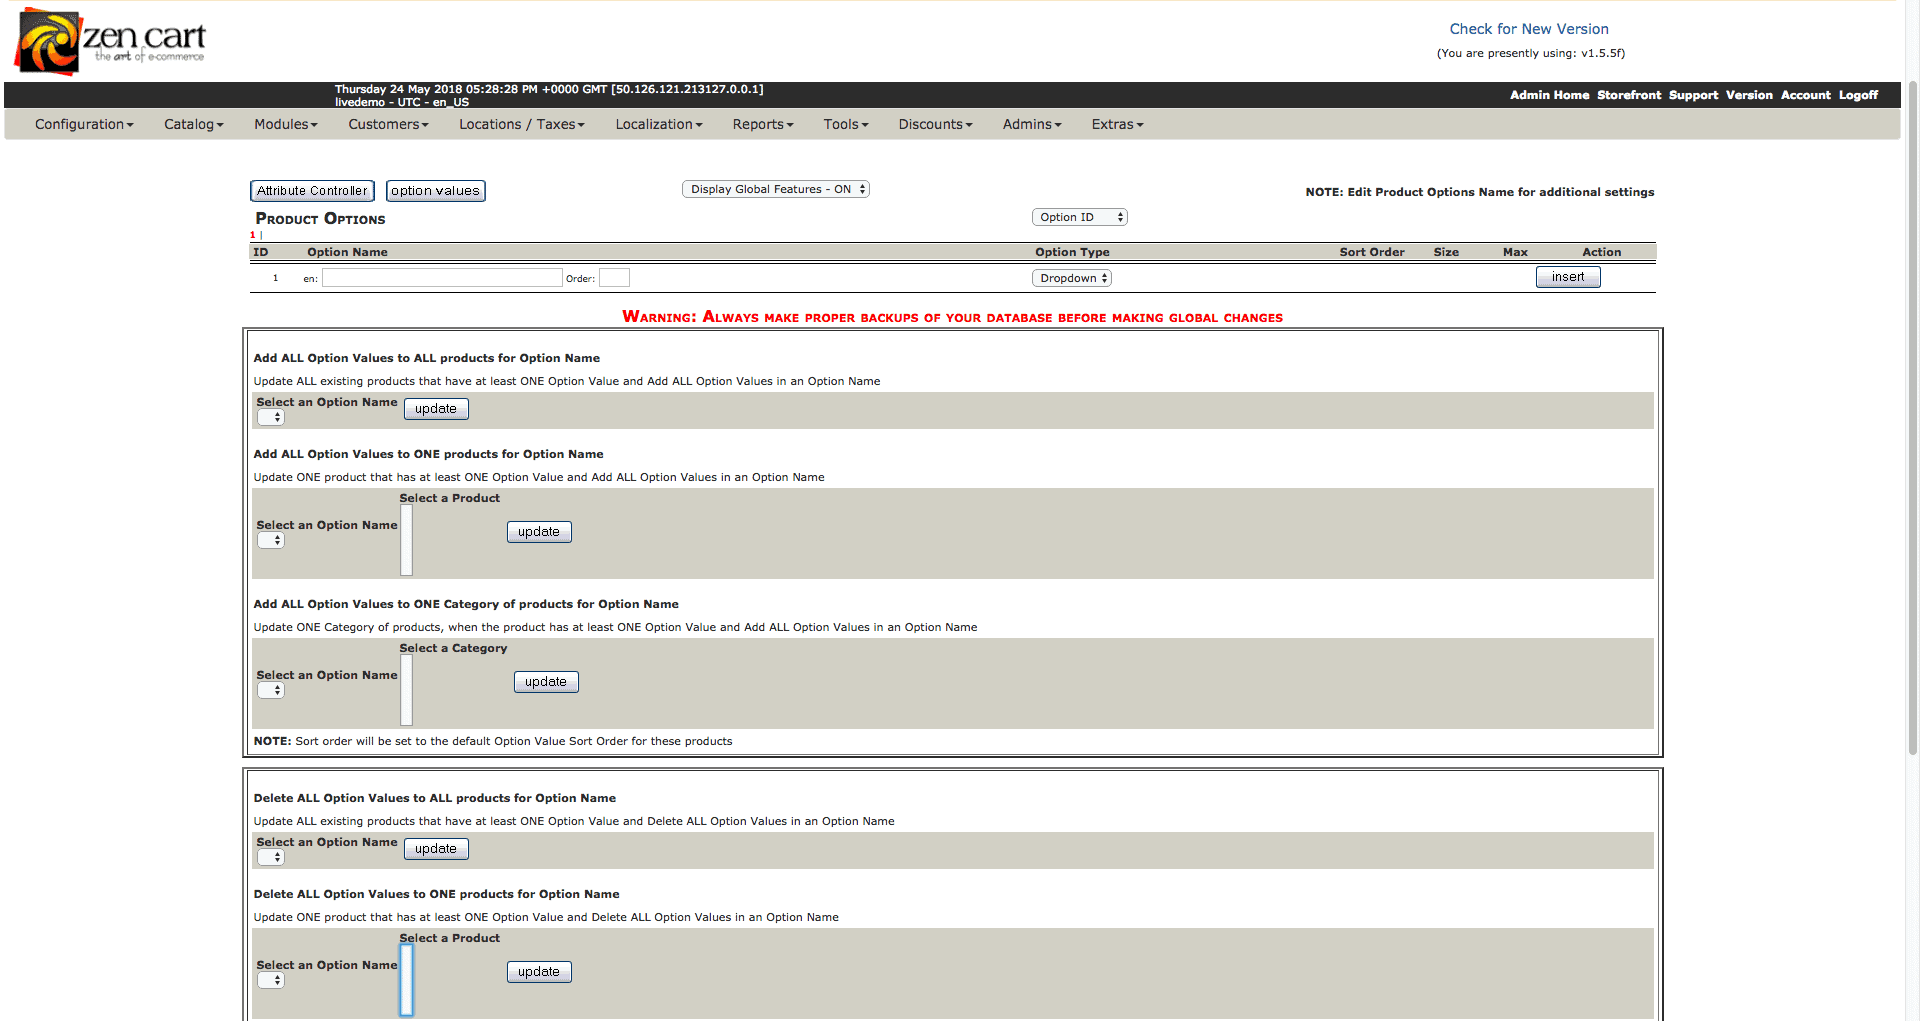 Screengrab of Zen Cart attribute controller page